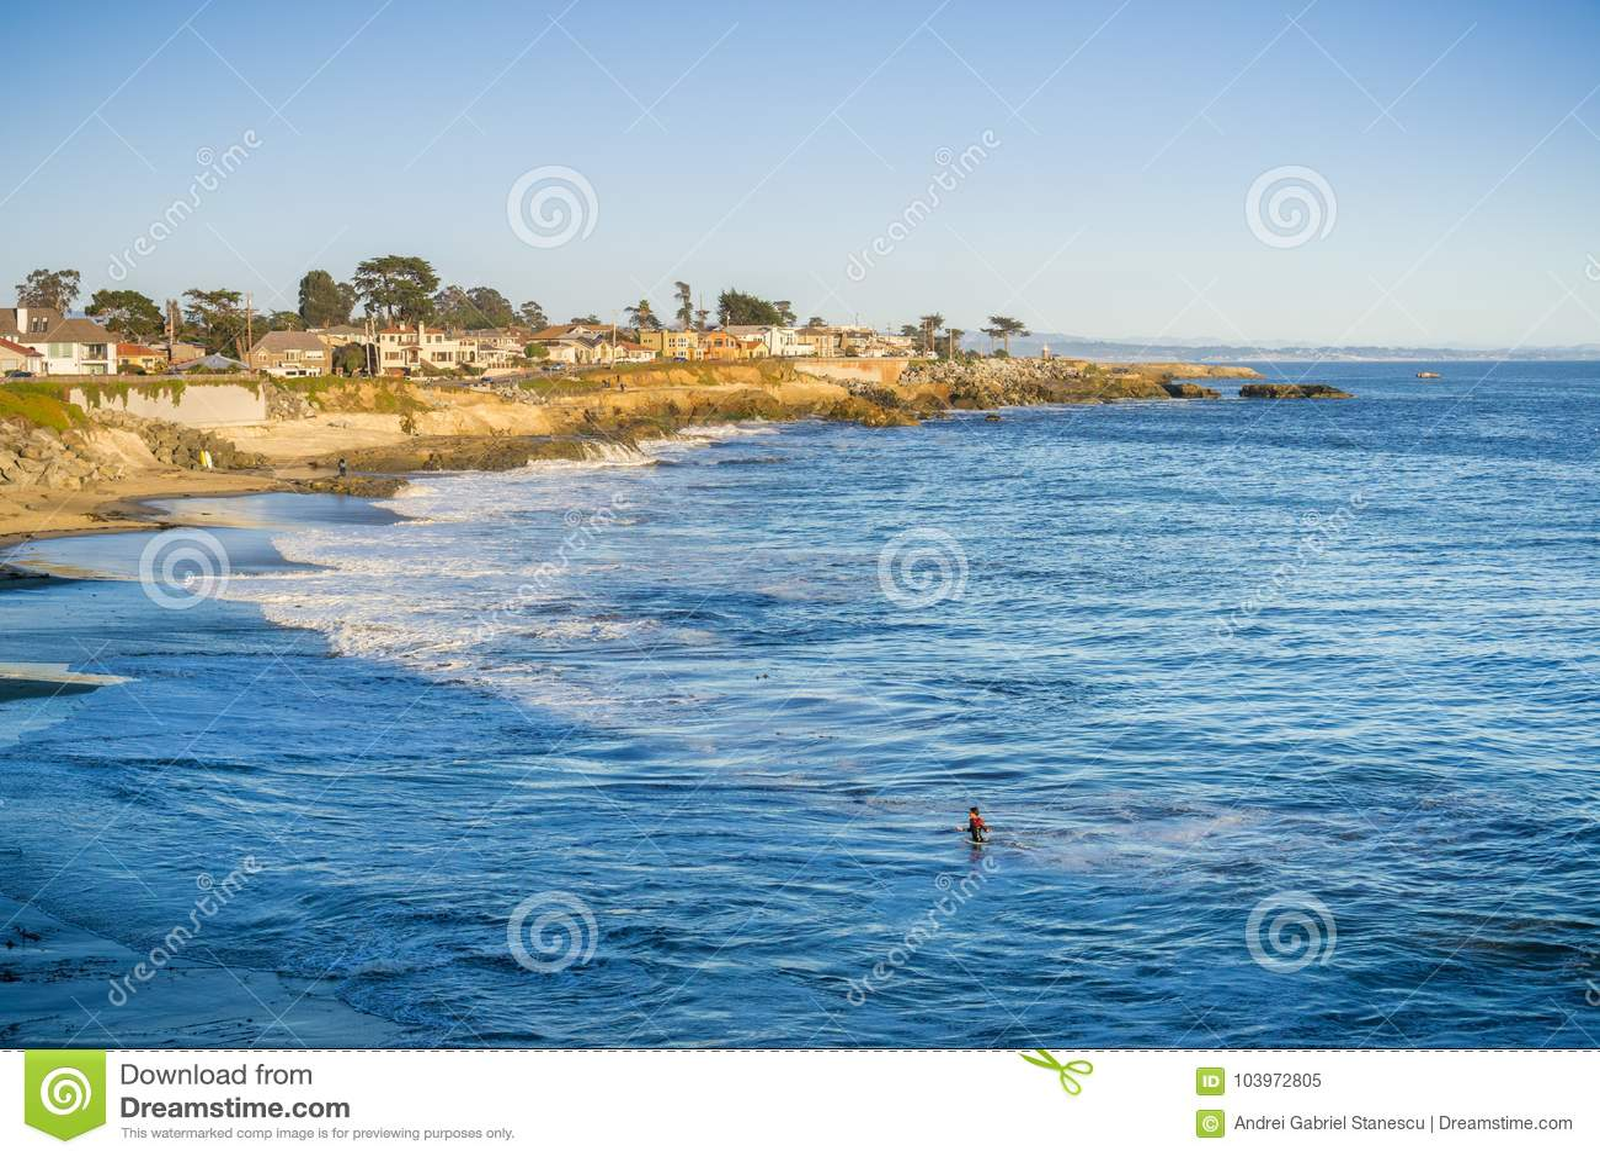 Casas perto do litoral corroído do Oceano Pacífico, Santa Cruz, Califórnia